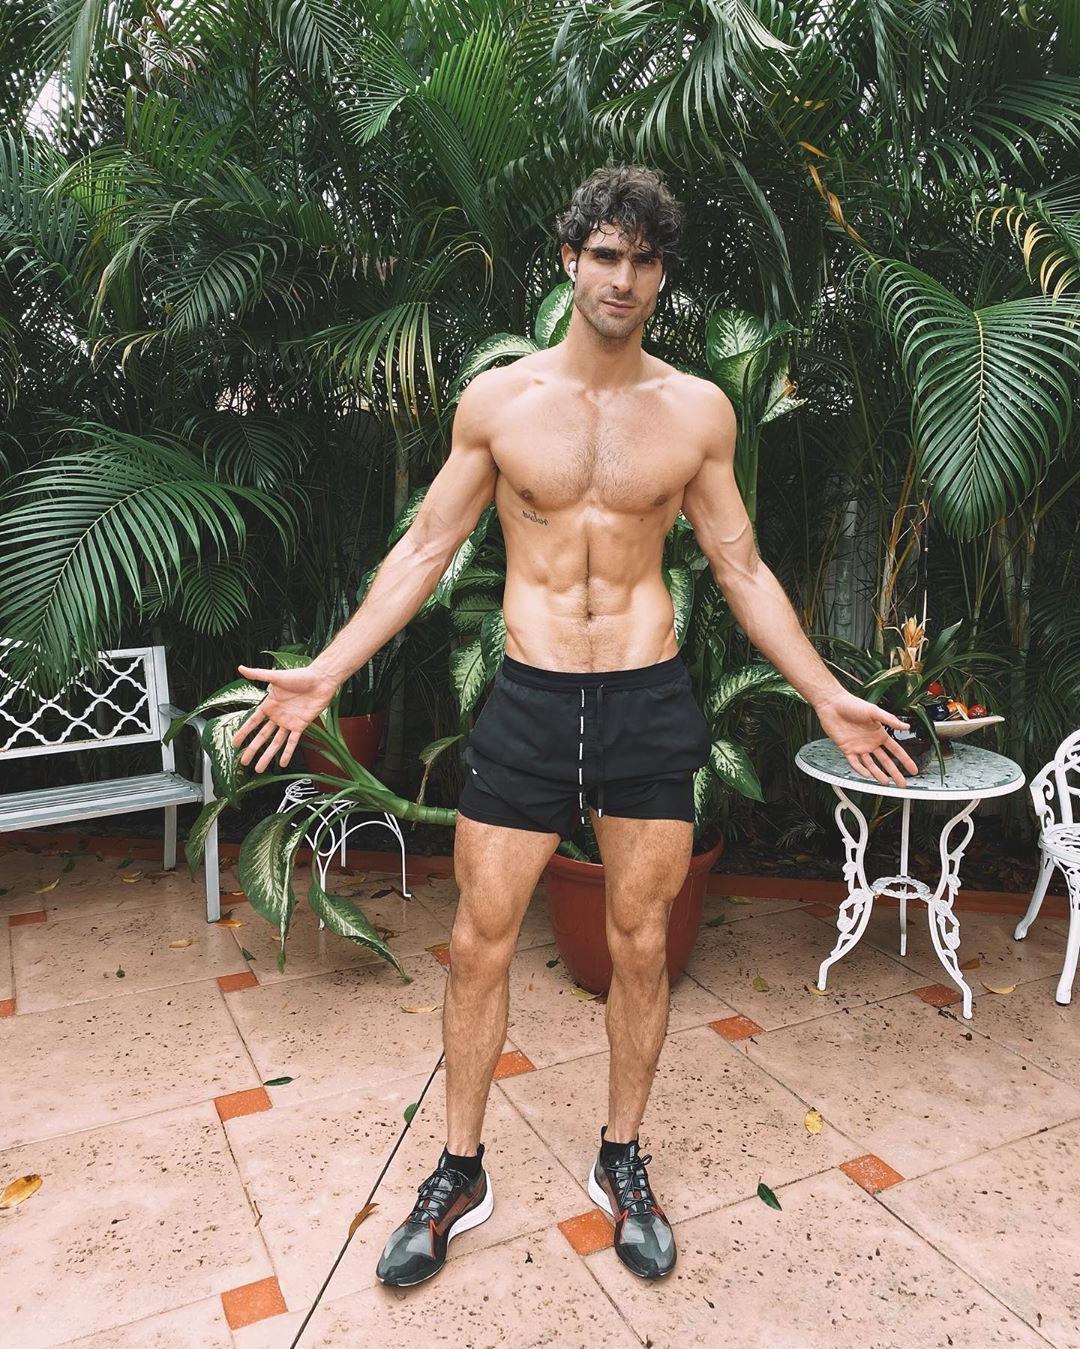 slim-fit-shirtless-guys-juan-betancourt-cyclist-body